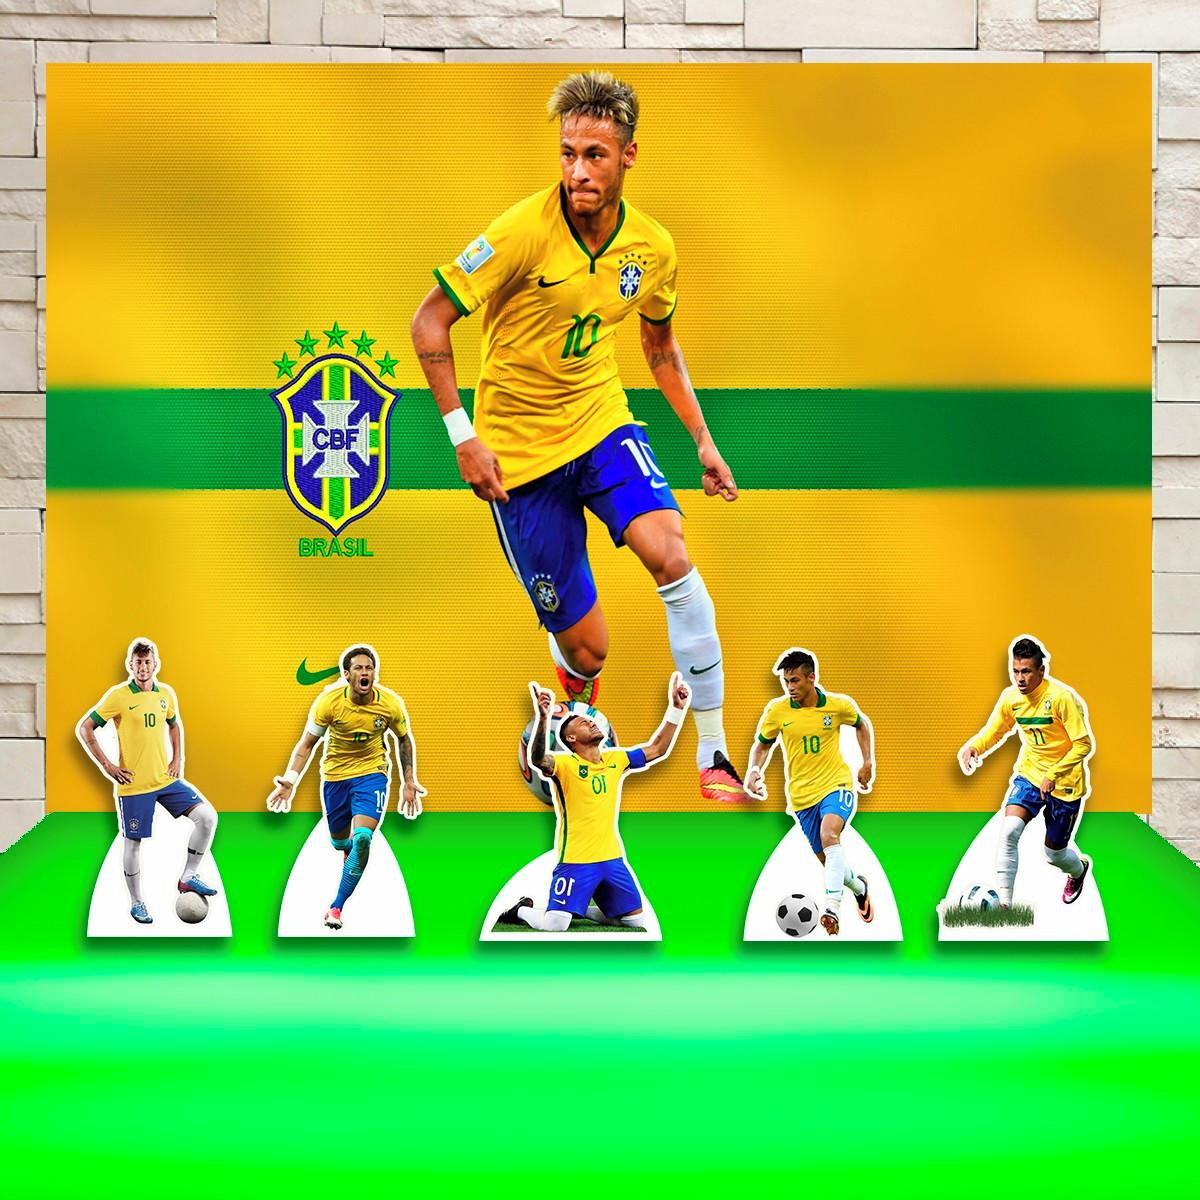 d19981400b8c30 Kit Festa Prata Painel + Display Futebol Jogador Neymar no Elo7 ...